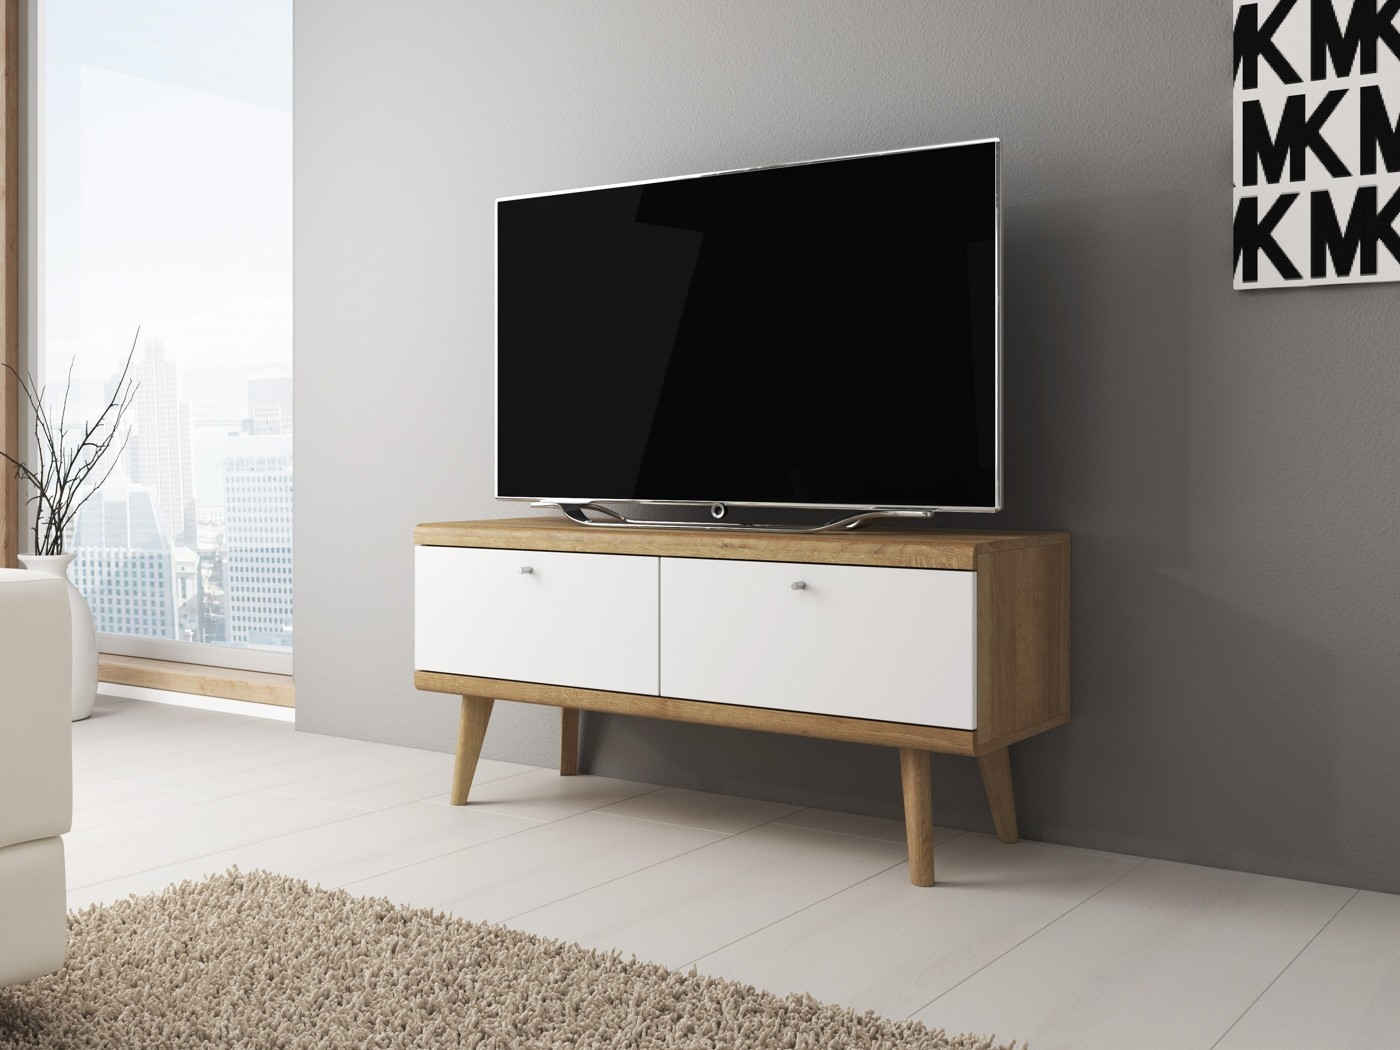 Bed Tv Meubel : Tv meubel primavera wit licht eiken cm actie meubella